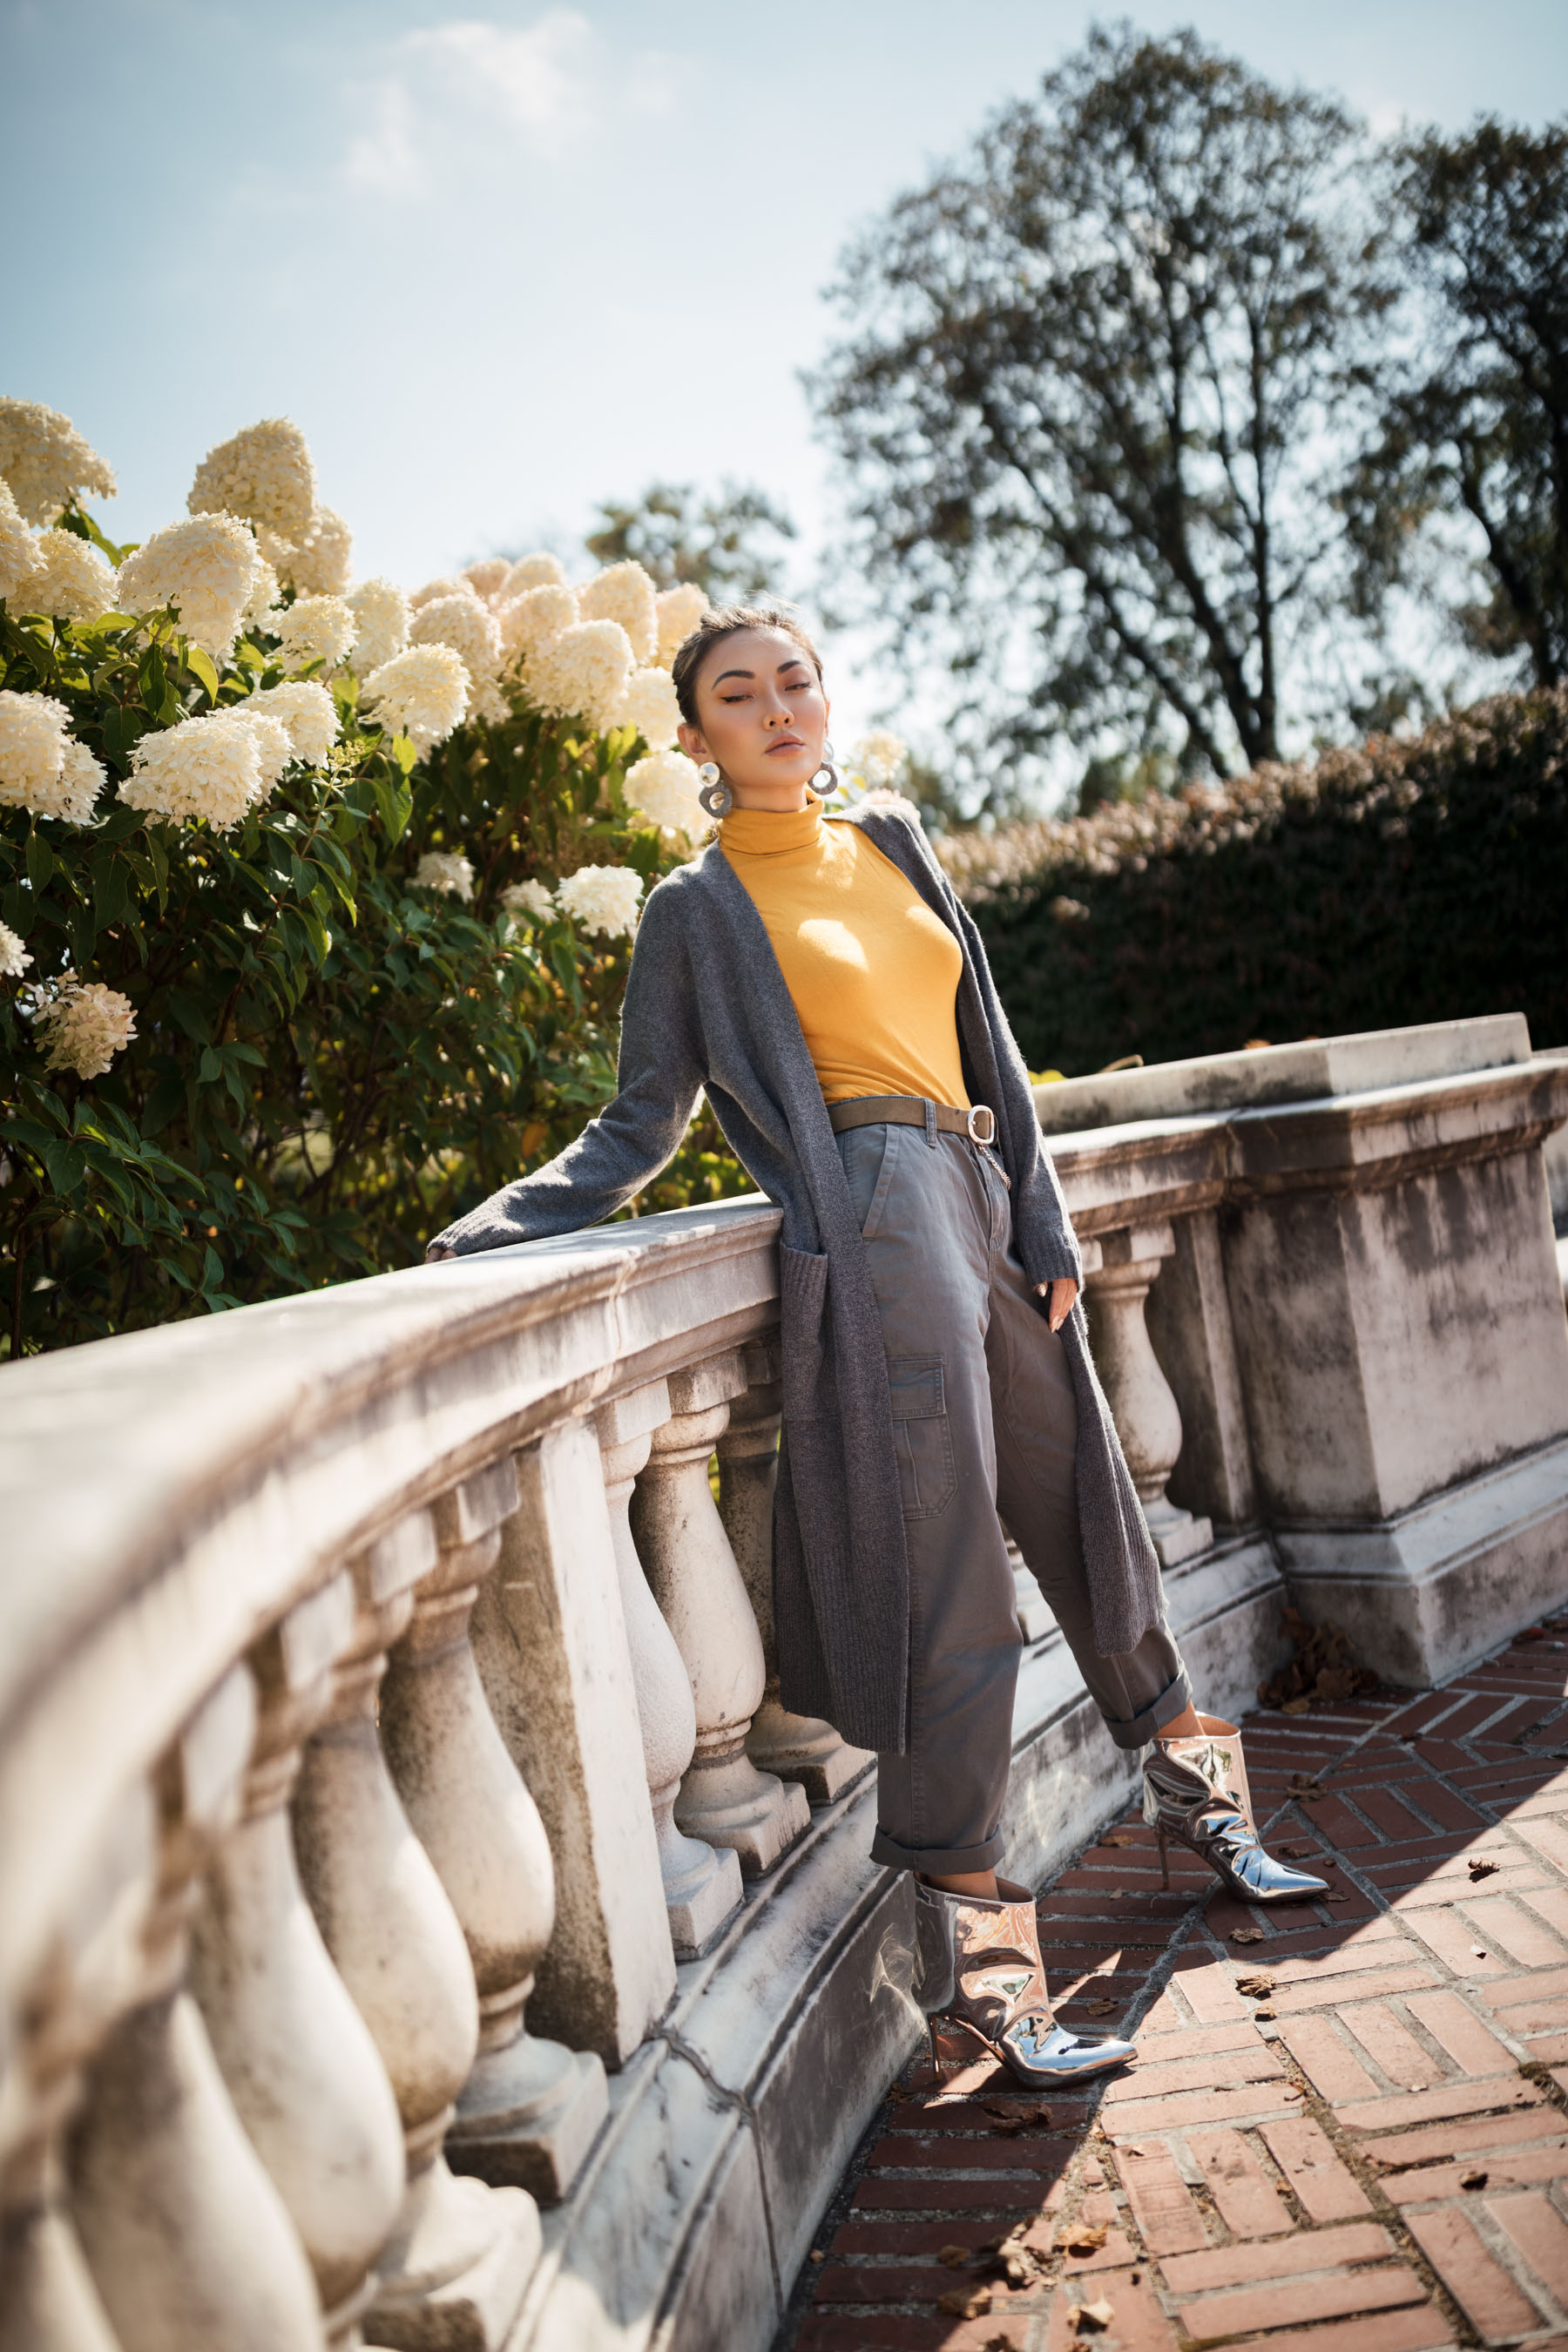 walmart scoop, scoop nyc, affordable fall fashion, utility fashion trend, cargo pants // Notjessfashion.com